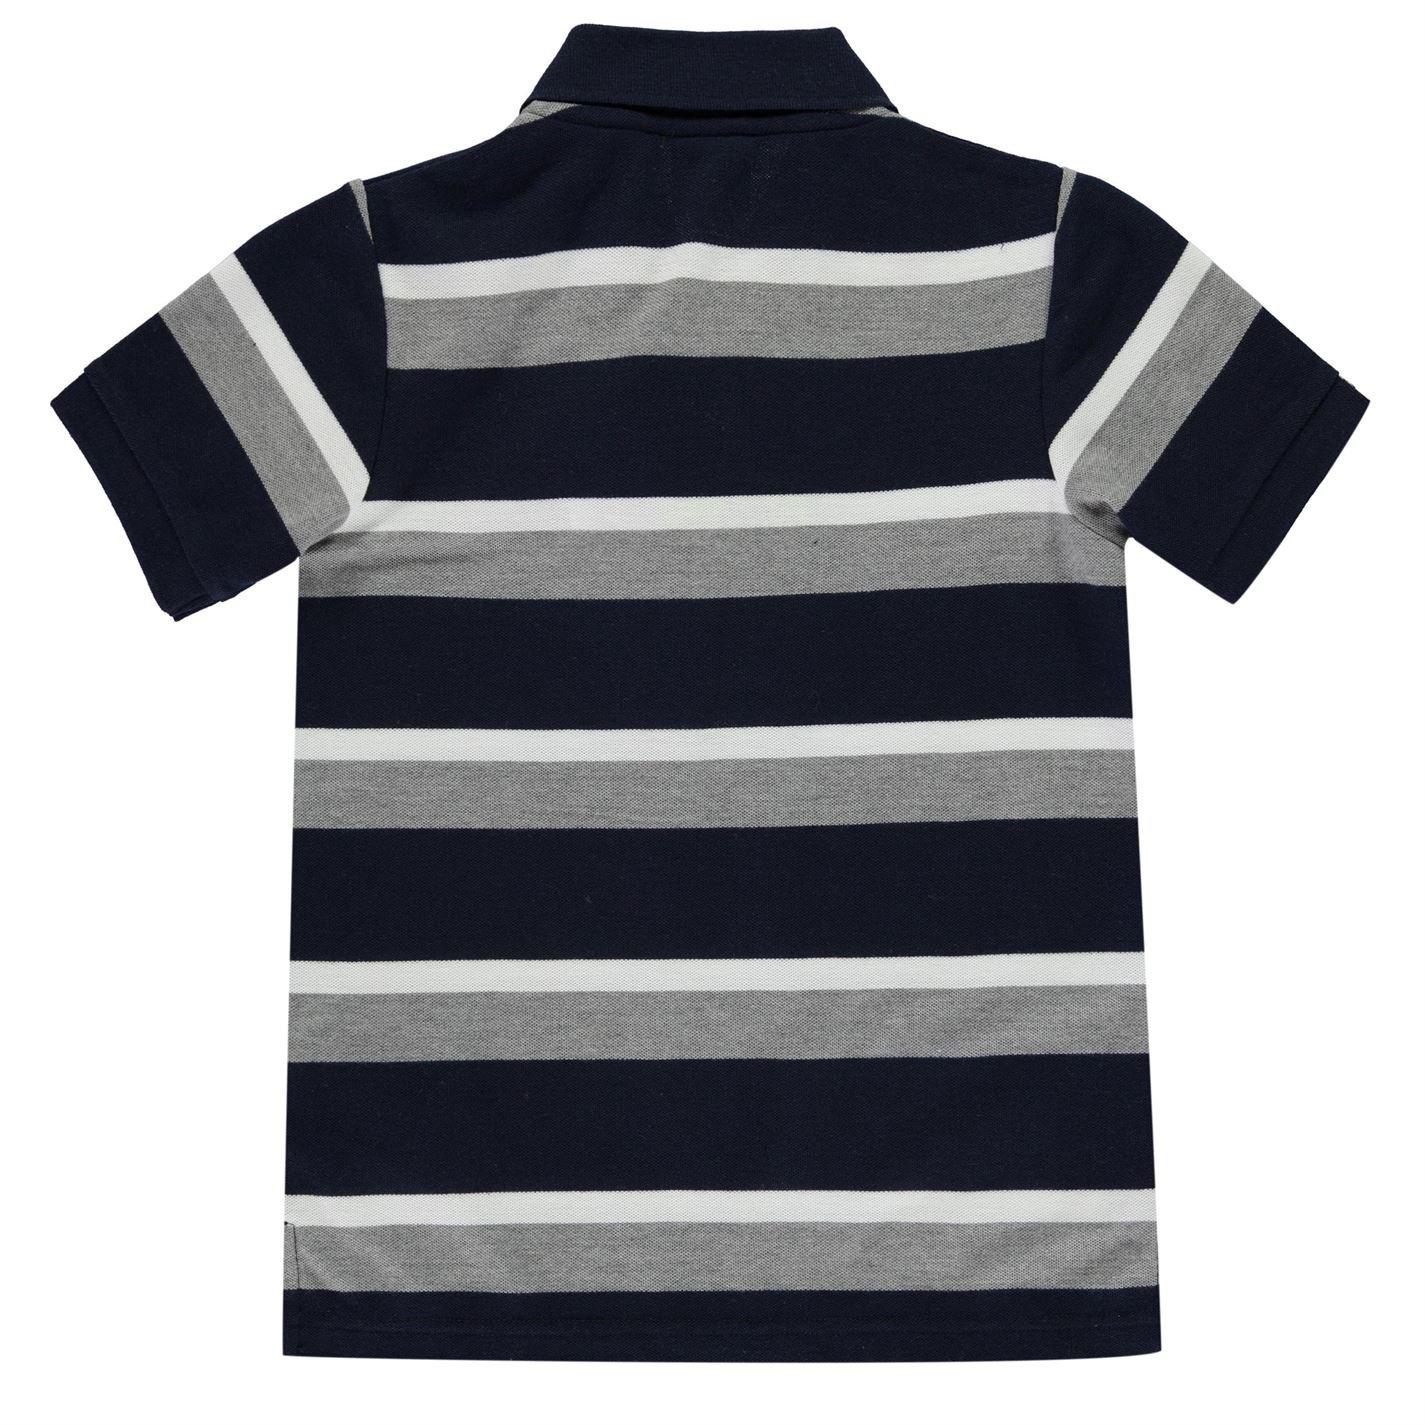 Lonsdale - Polo - Manga Corta - para niño Navy/Grey/White Large ...